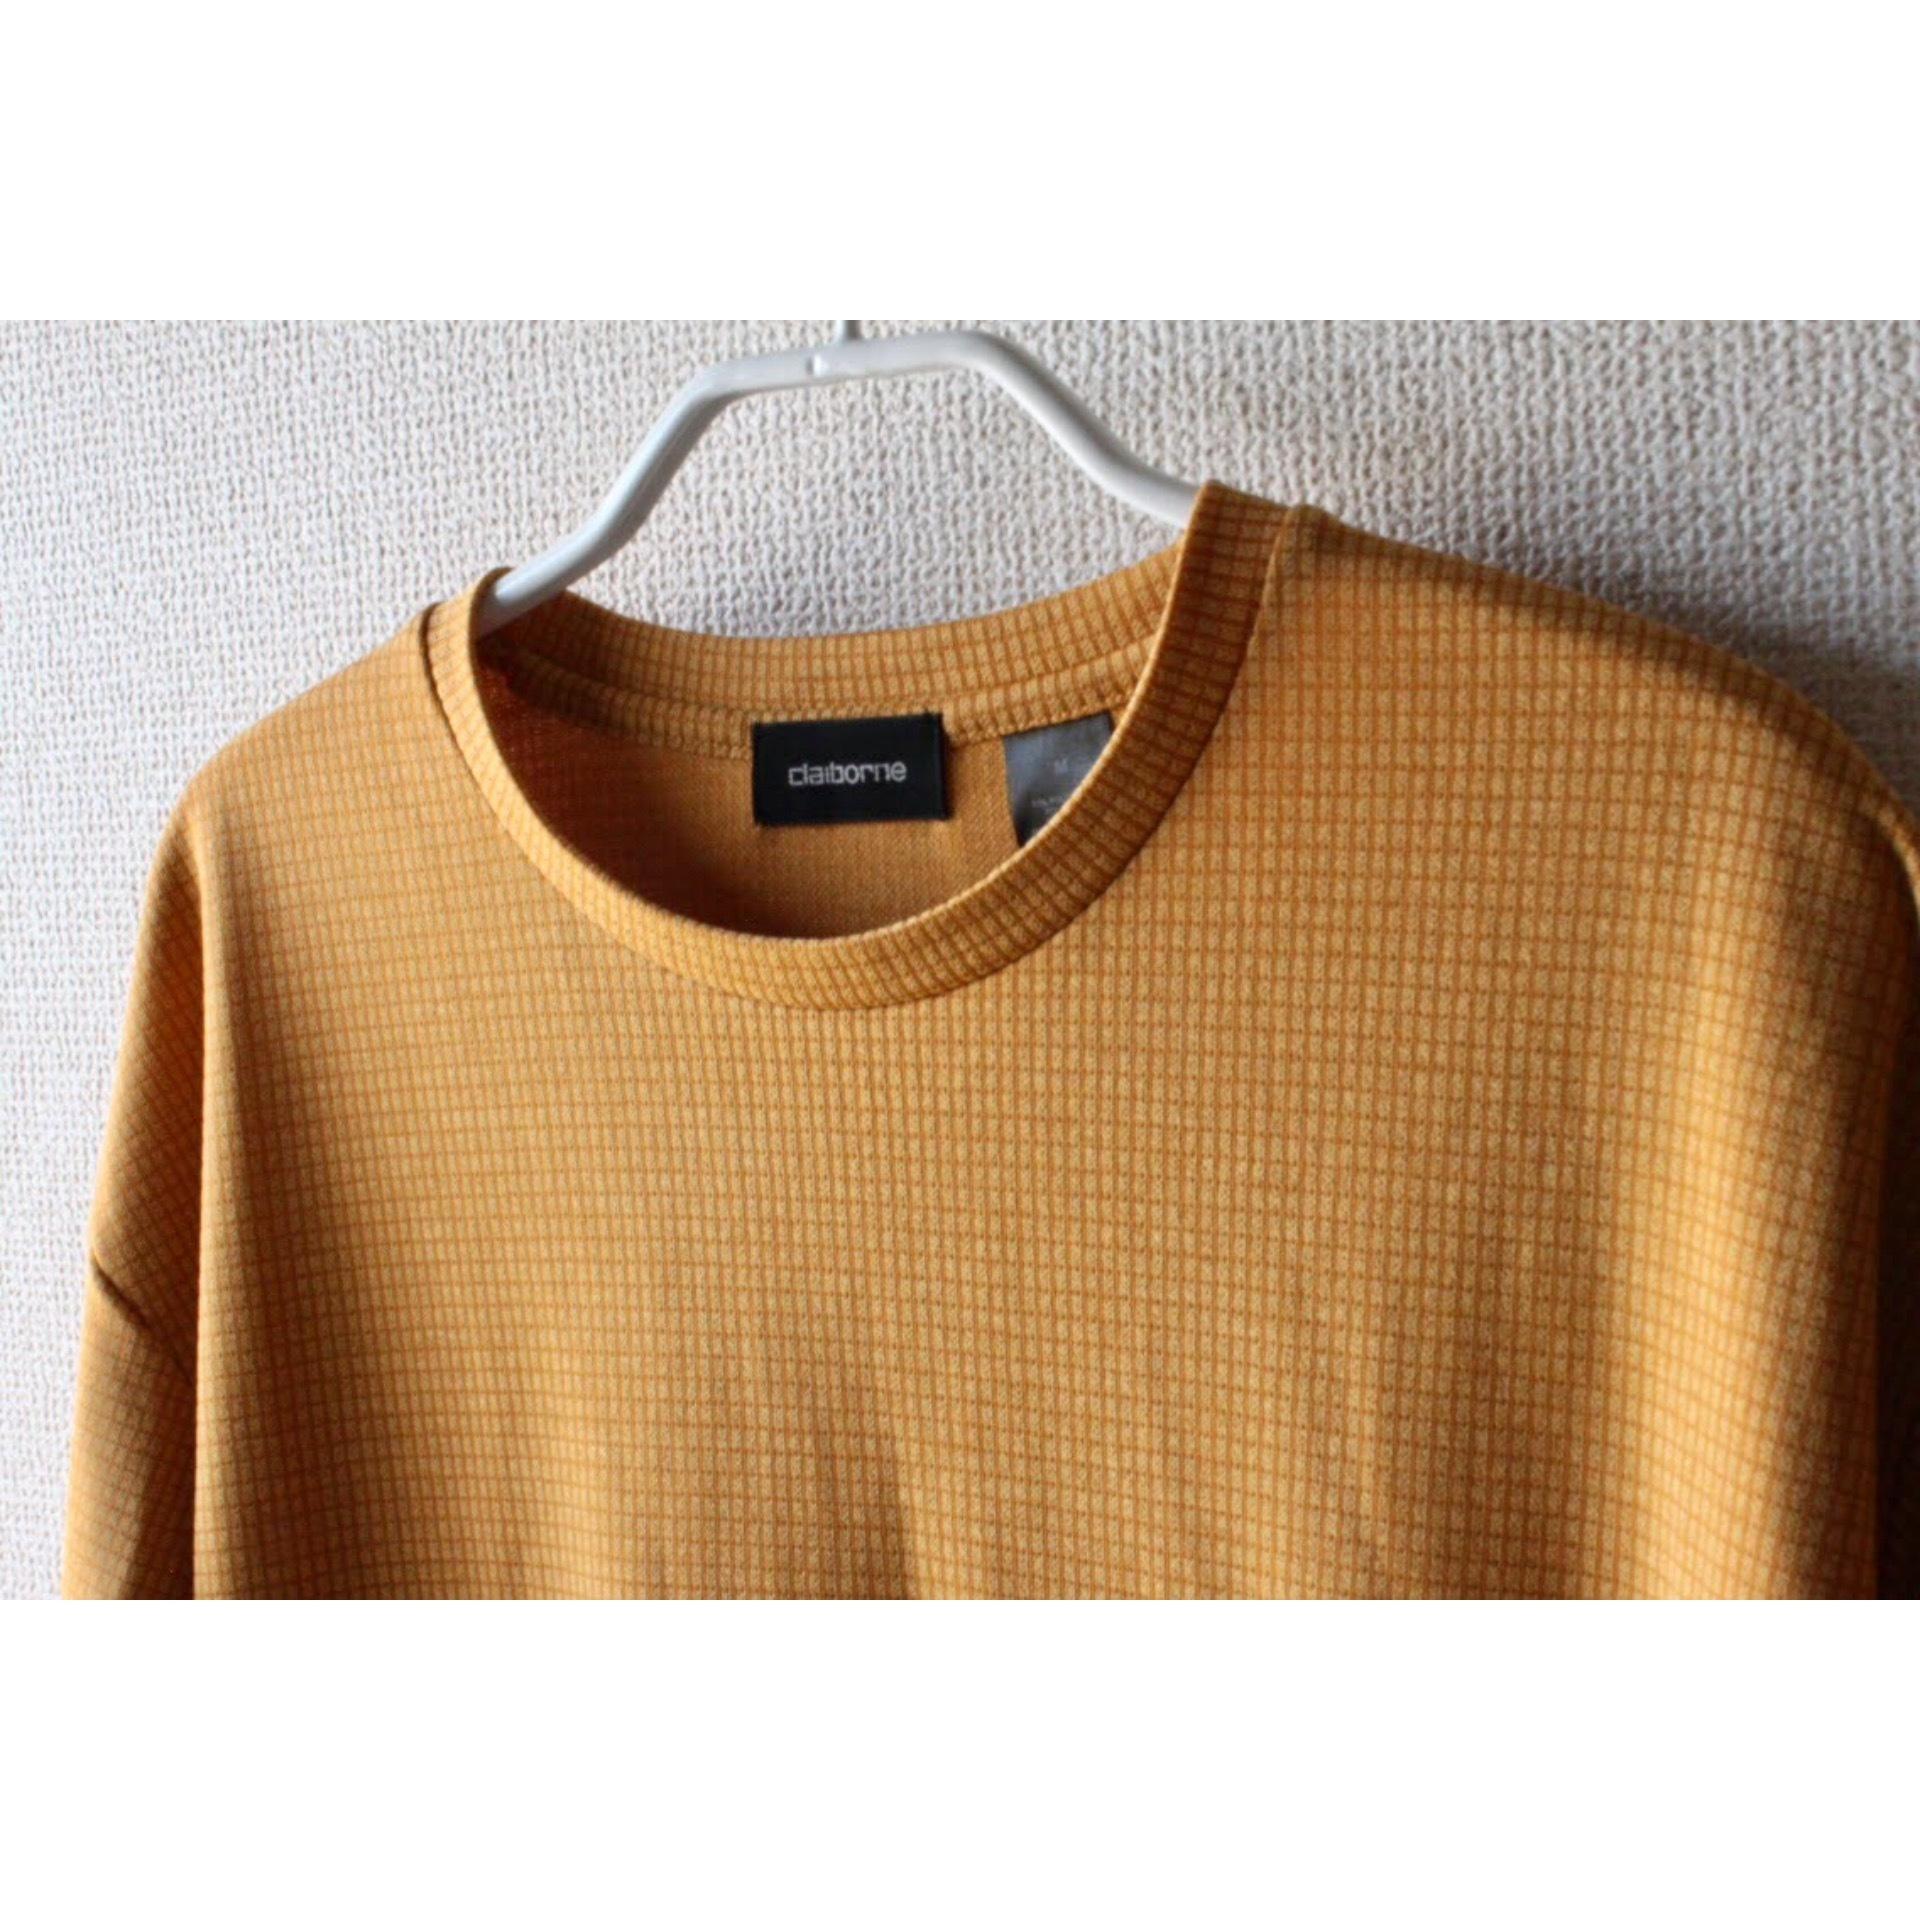 Vintage orange t shirt